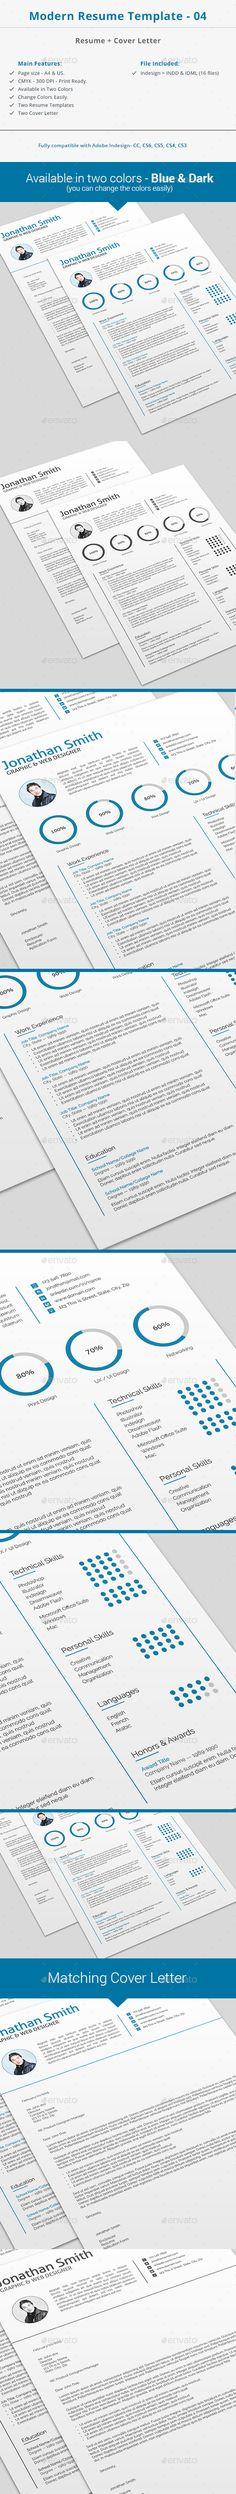 Modern Resume Template 04 18 best